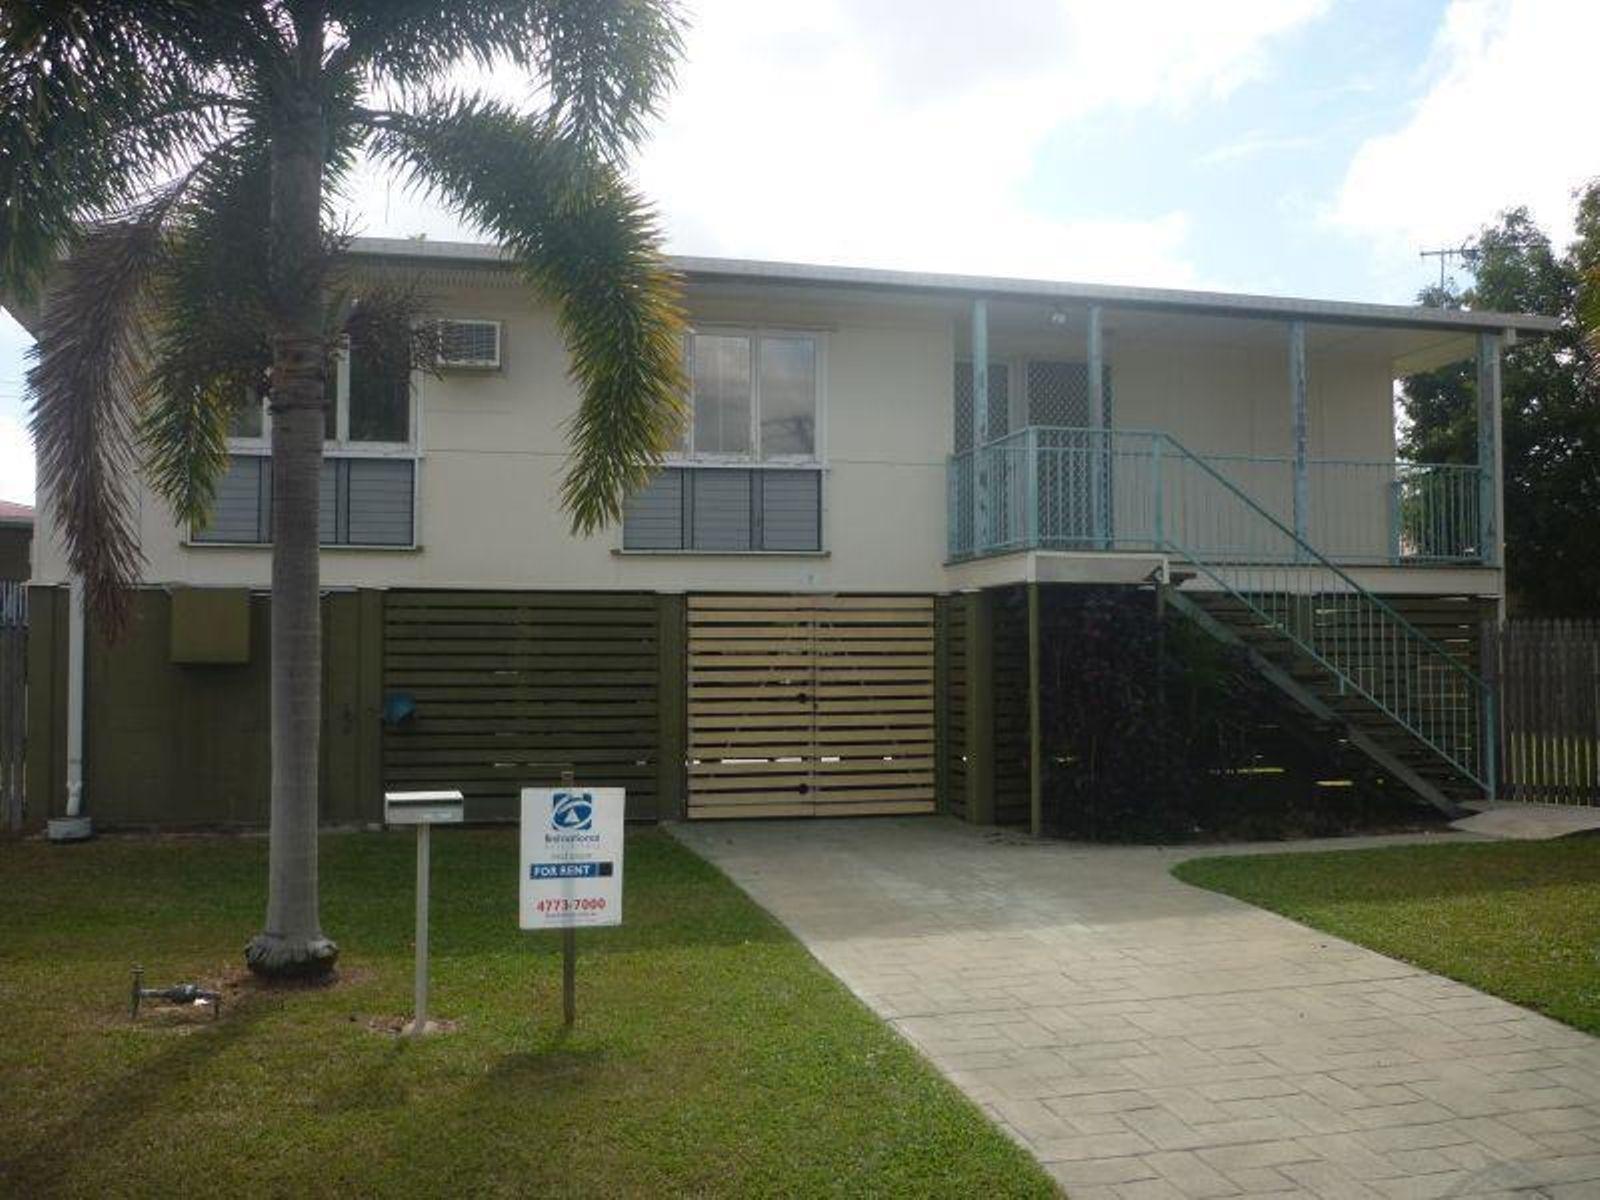 7 Ferris Court, Aitkenvale, QLD 4814